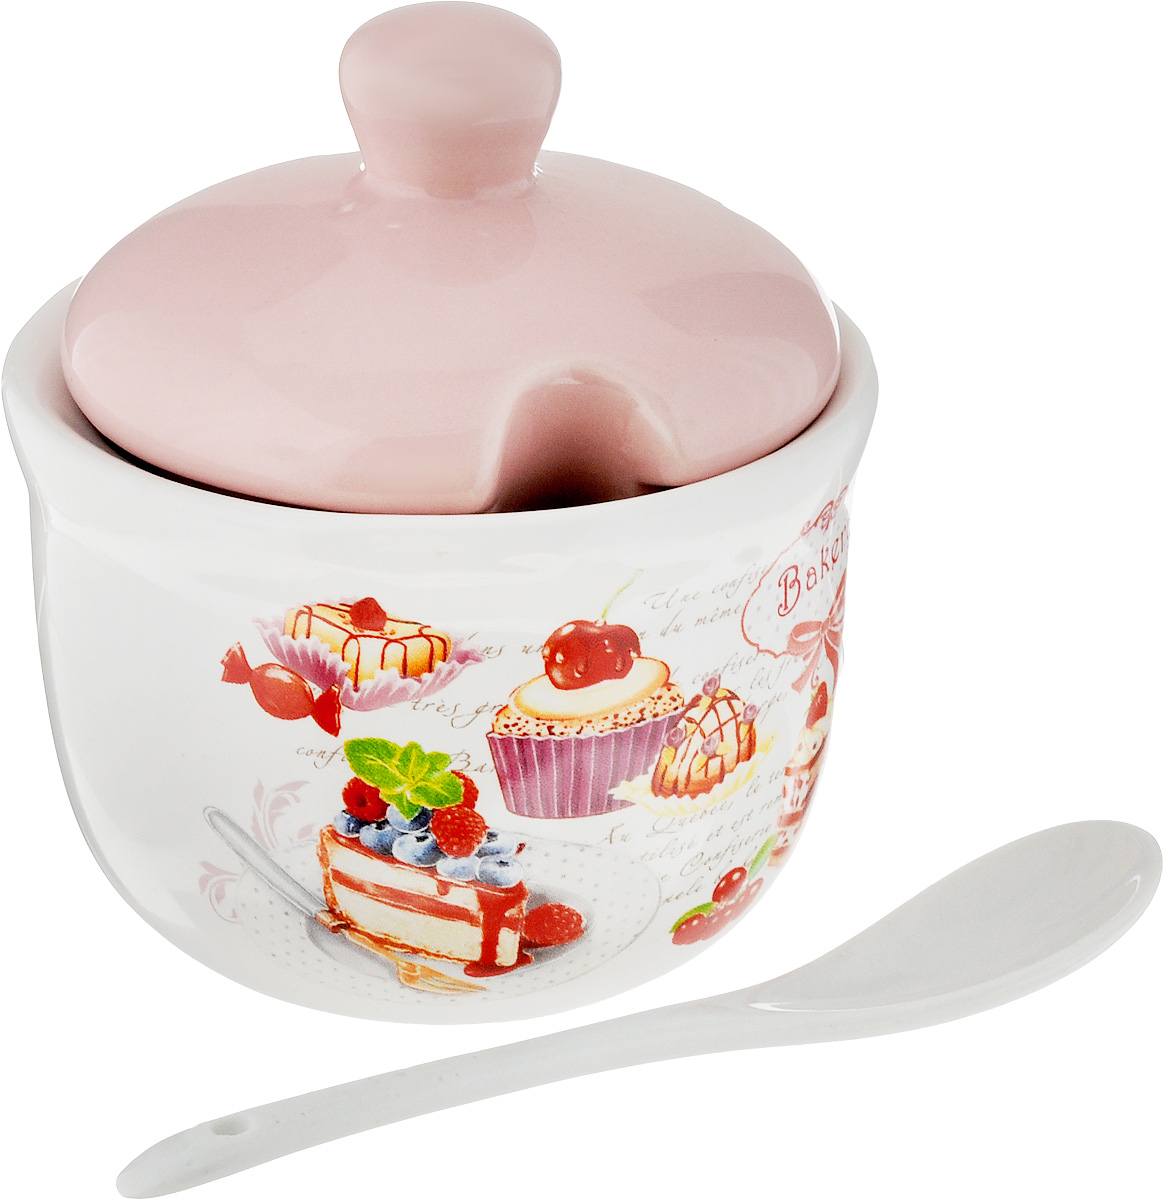 Сахарница ENS Group Бисквит, с ложкой, цвет: розовый, белый, 300 мл, 2 предмета. L3170209